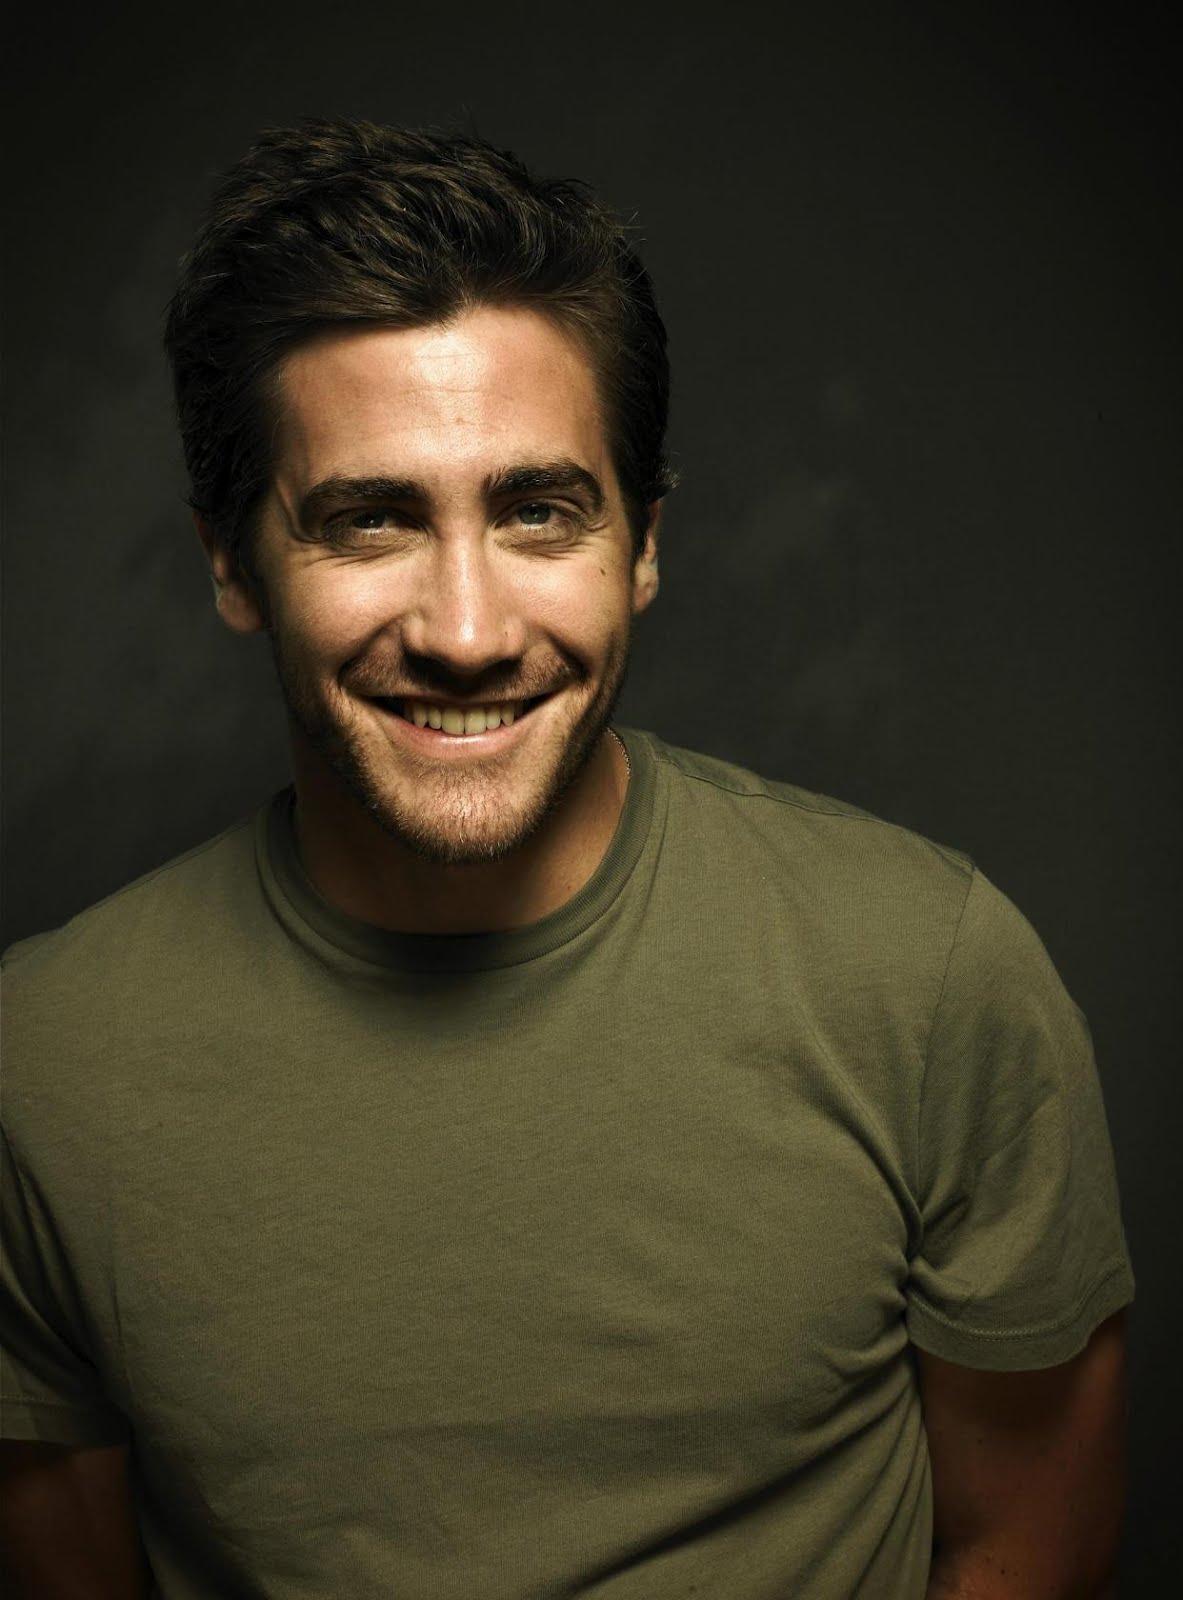 http://3.bp.blogspot.com/-HX-Vw-a1QFg/T2NDARfIXSI/AAAAAAAAB2U/XTOEDmEoRzY/s1600/persia-may20-jake-gyllenhaal-as-dastan-prince-of-persia.jpg